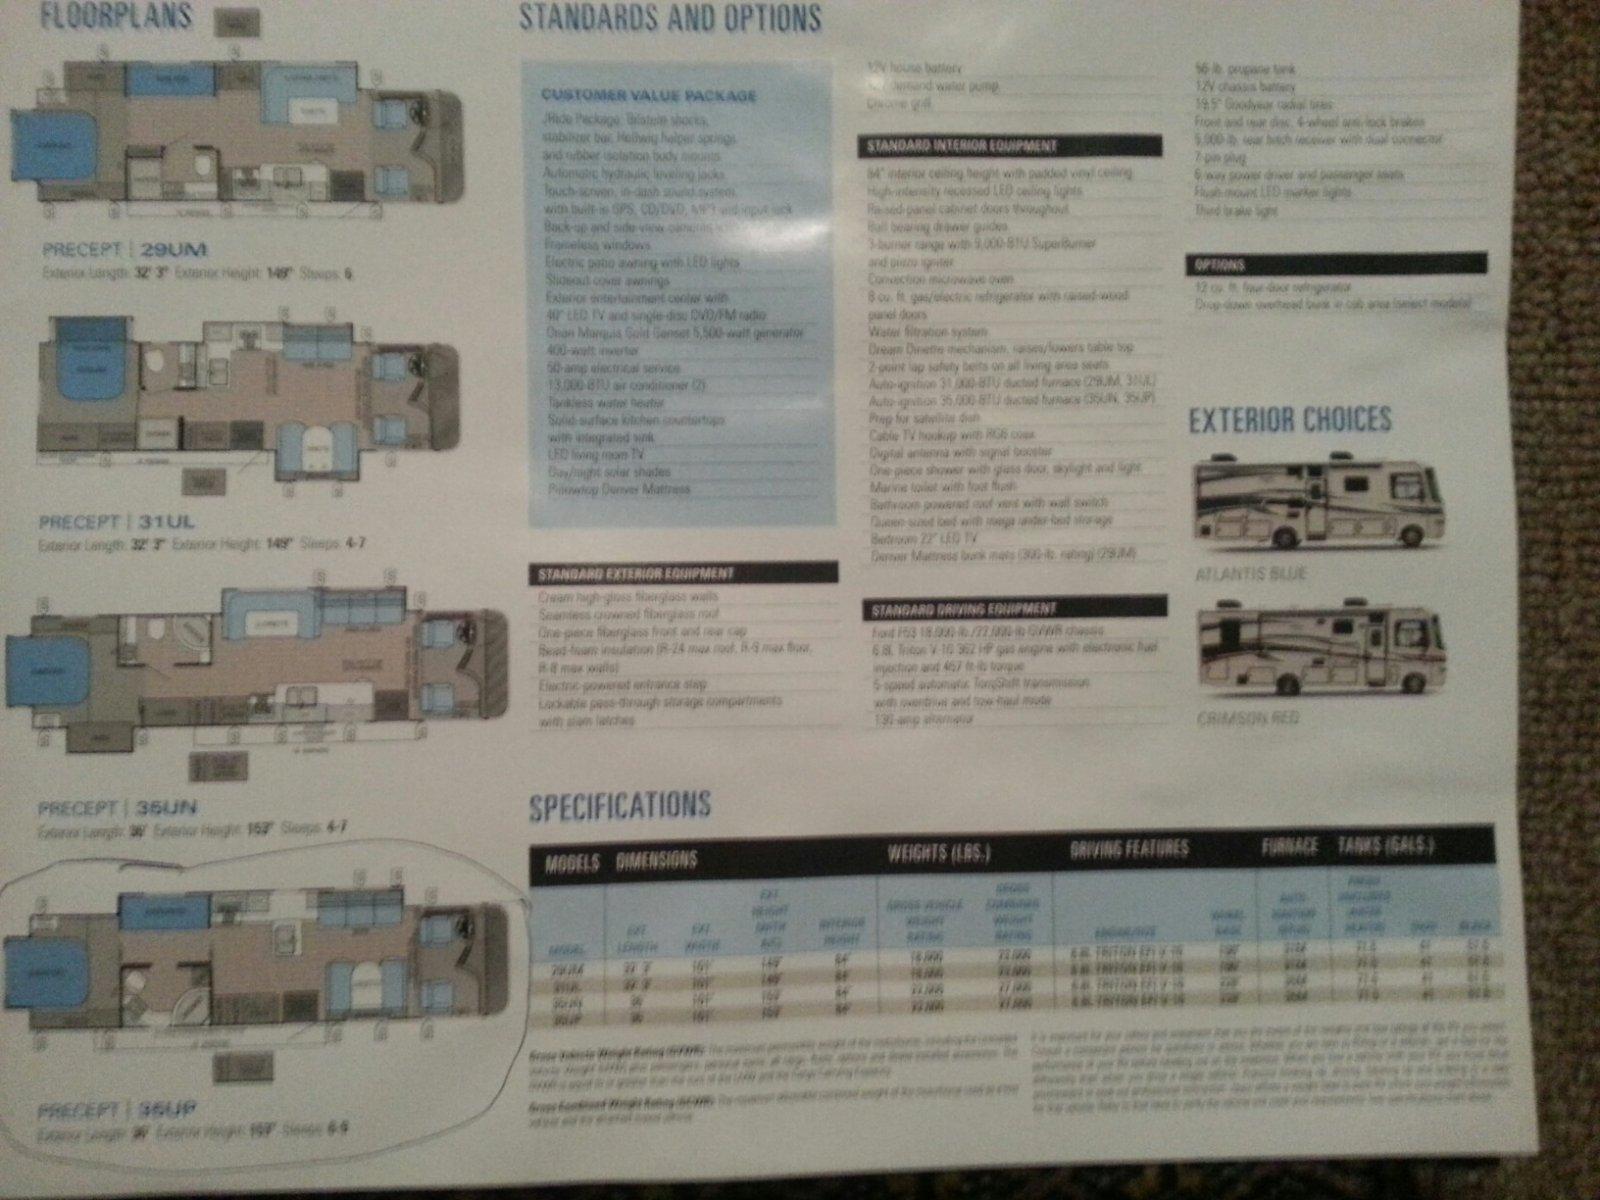 Click image for larger version  Name:Precept - Brochure - Floor Plans.jpg Views:132 Size:237.3 KB ID:74369